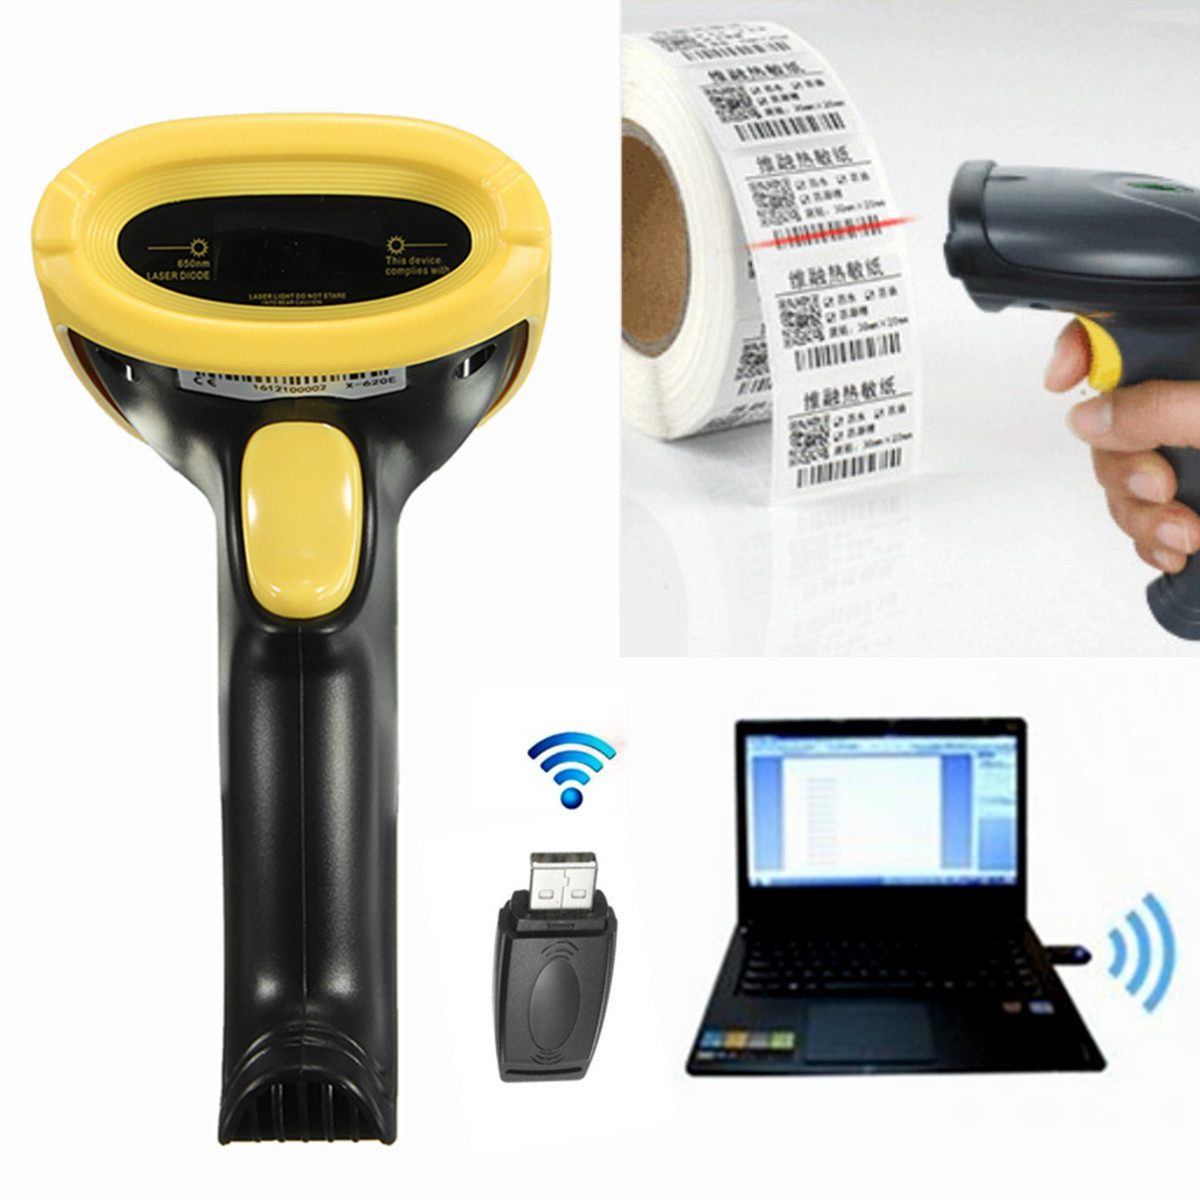 2.4GHz USB WIFI Handheld Visible Wireless Laser Cordless Barcode Scanner Reader